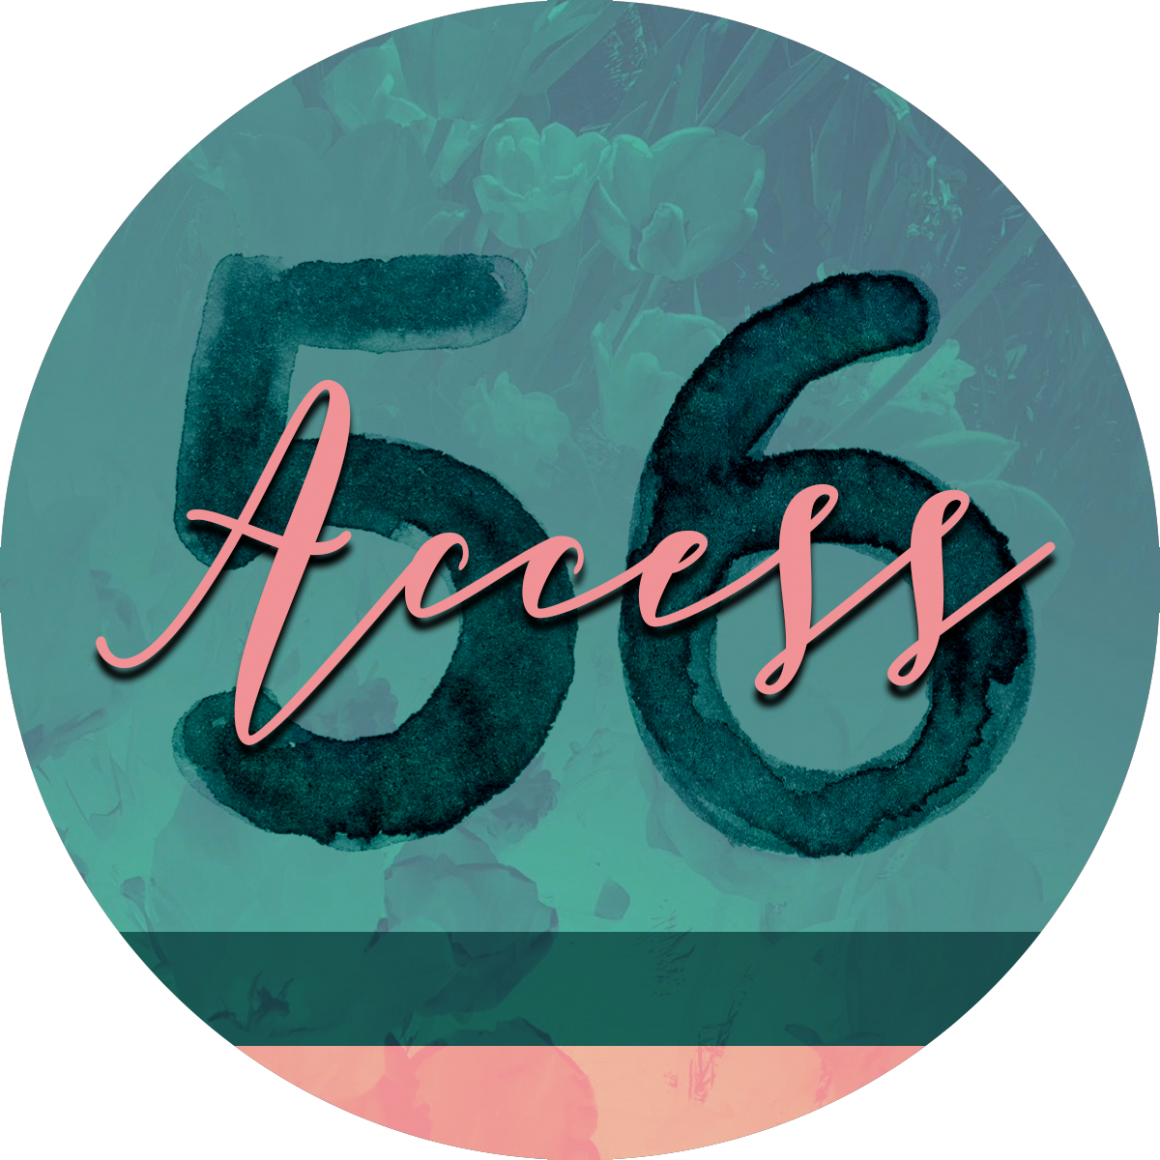 Access 56